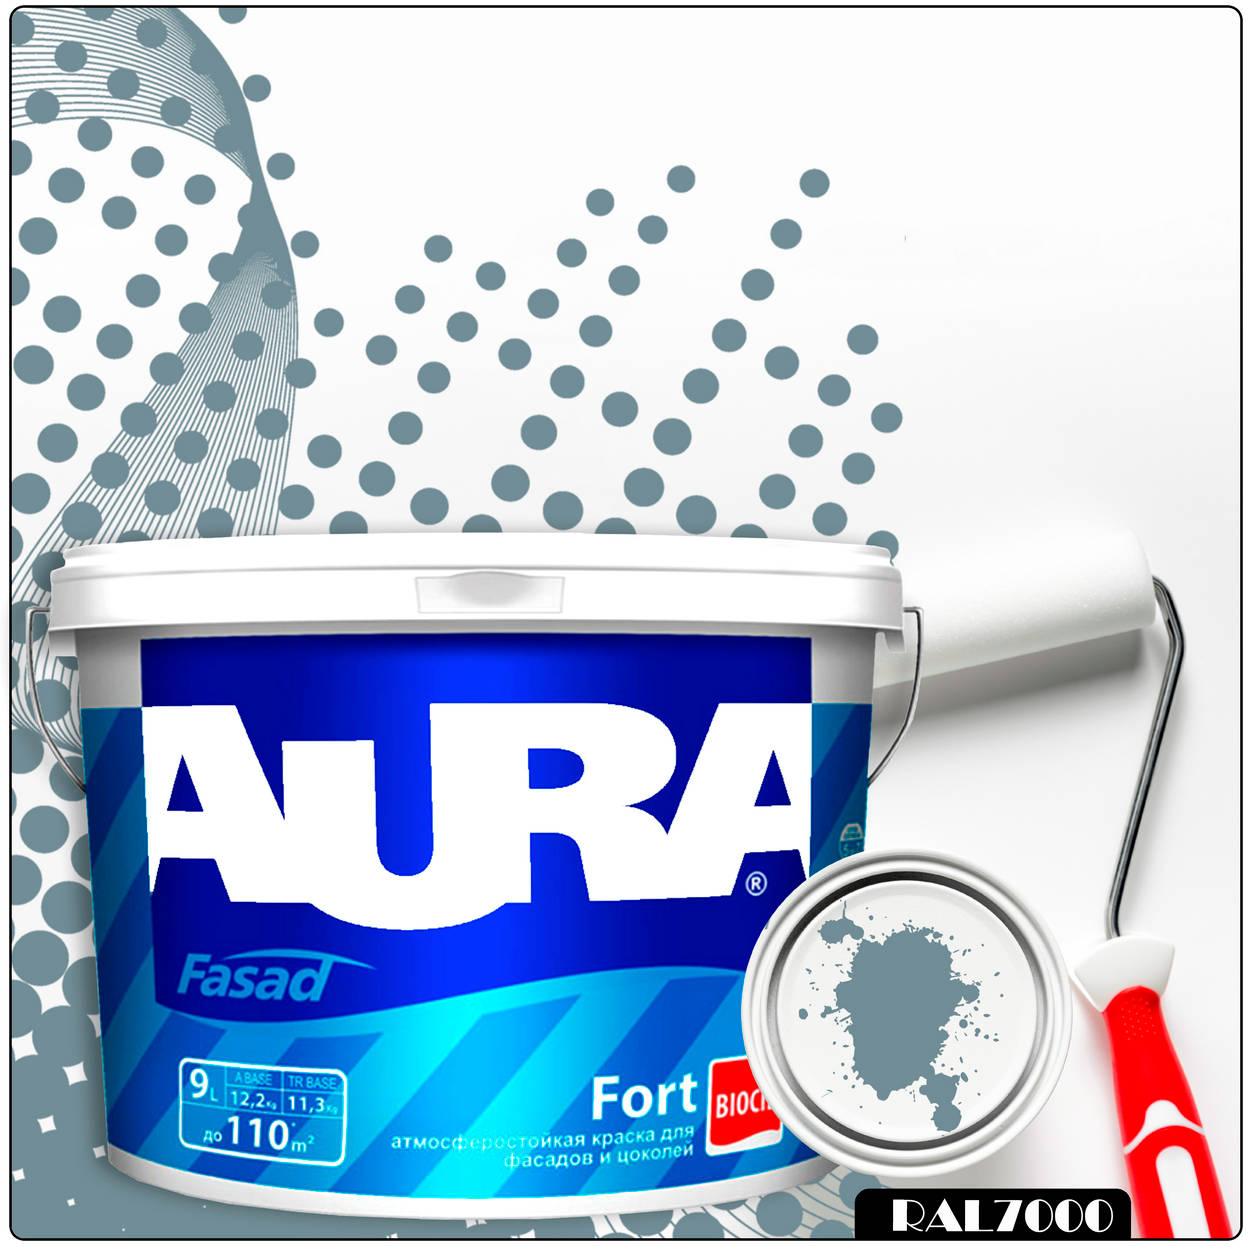 Фото 22 - Краска Aura Fasad Fort, RAL 7000 Серая белка, латексная, матовая, для фасада и цоколей, 9л, Аура.